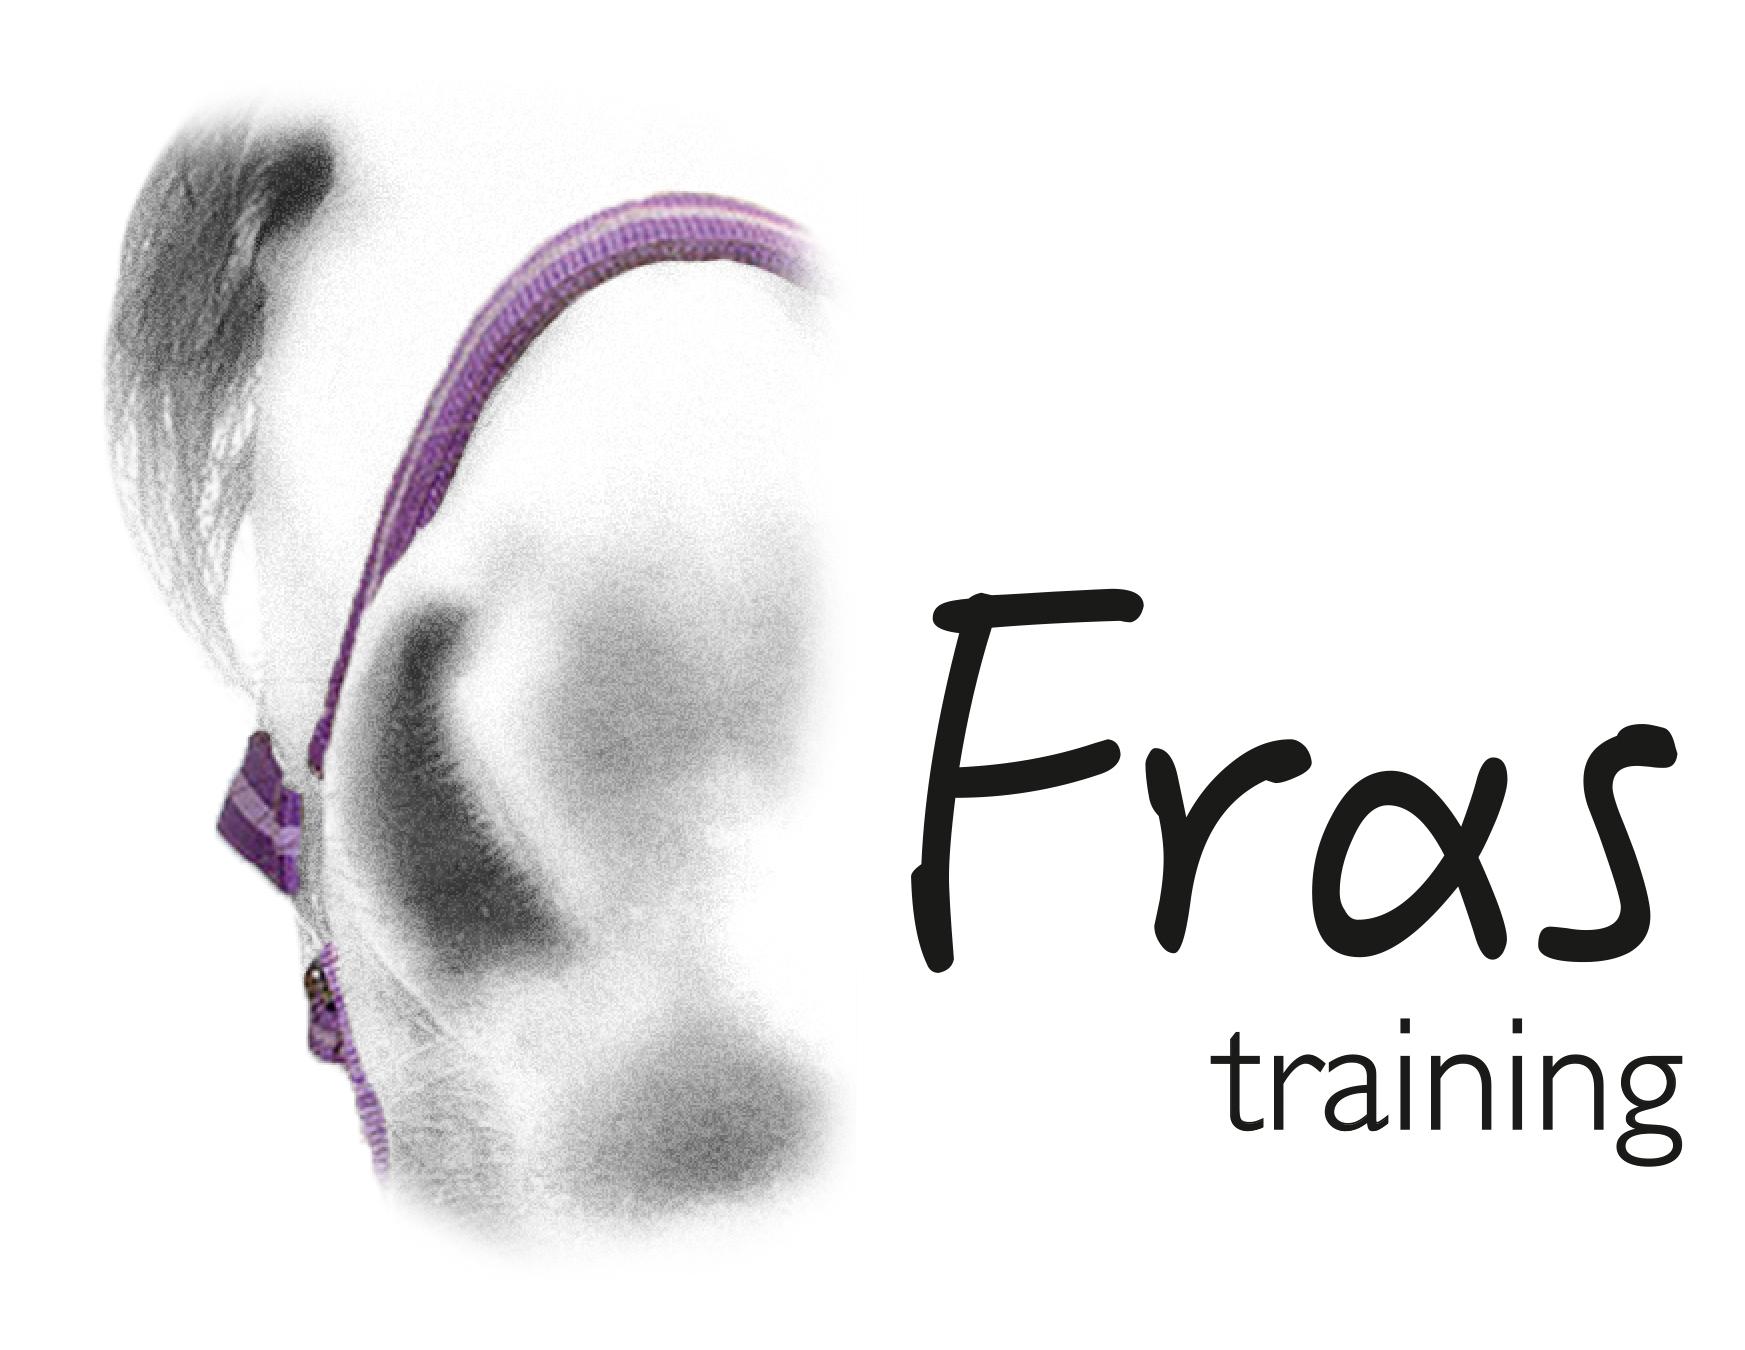 FRAS training logo